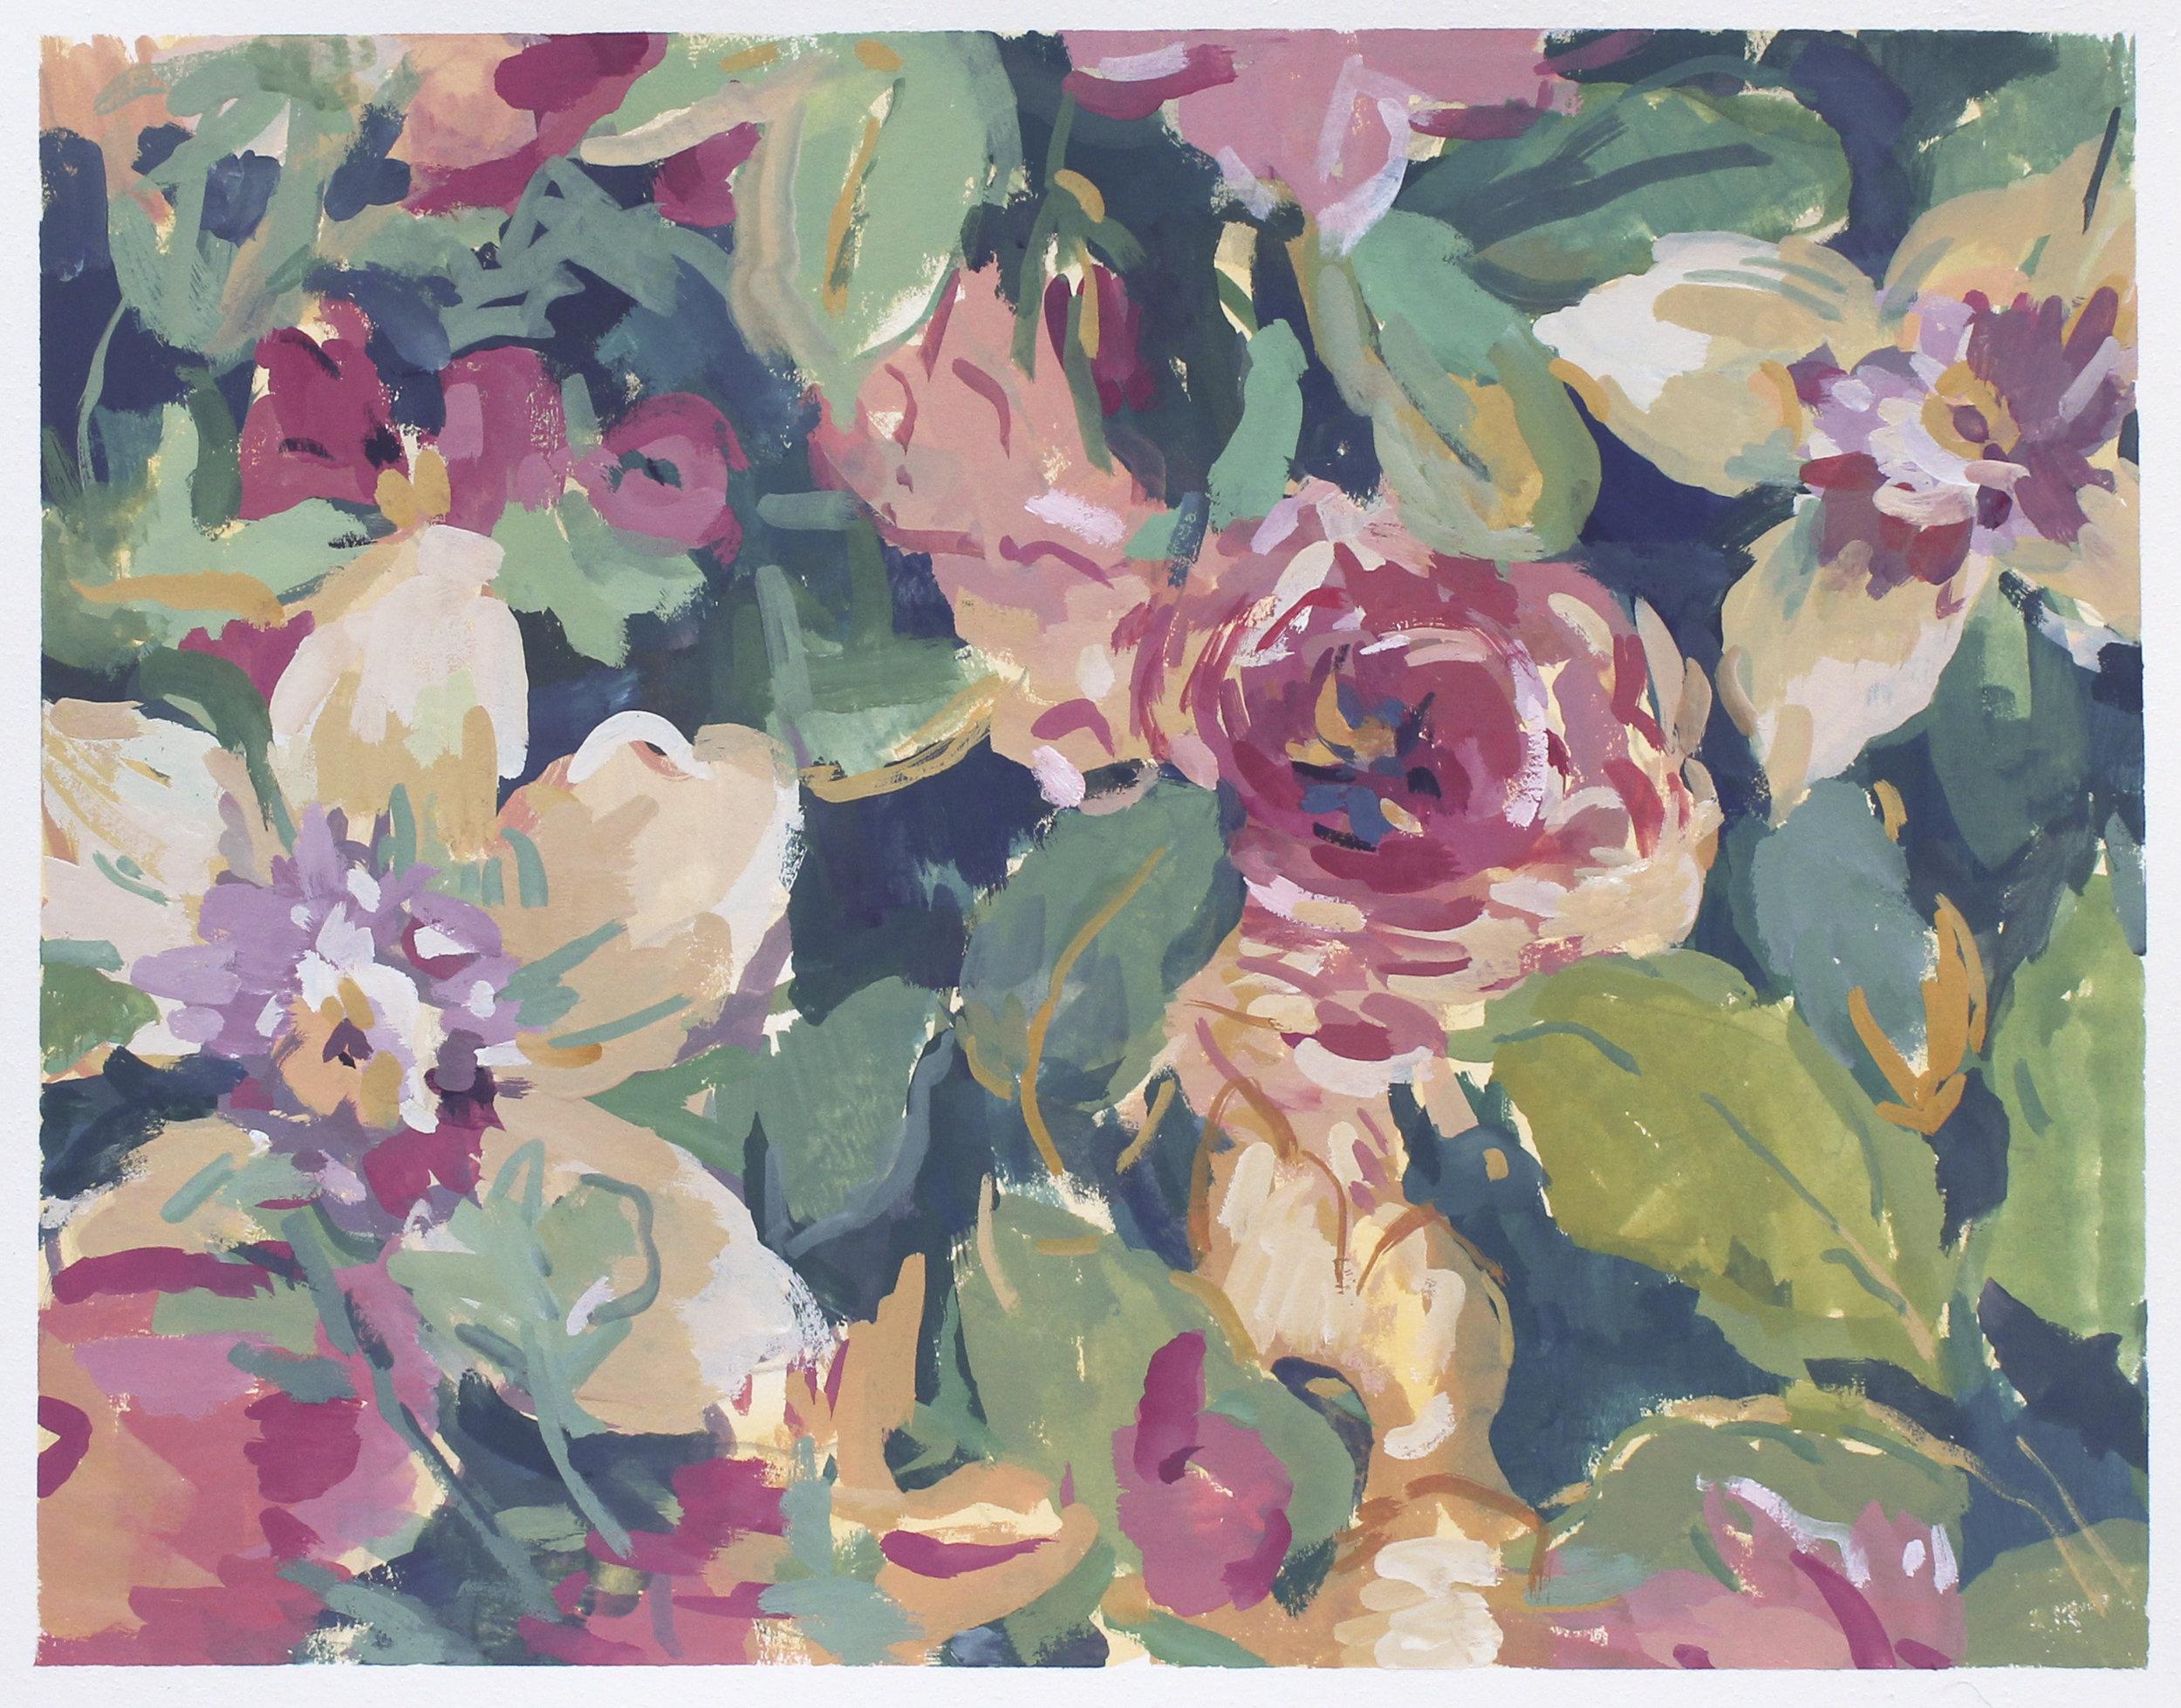 "scrap flower fabric  gouache on paper 10.5x13.25"" 2017   purchase prints"